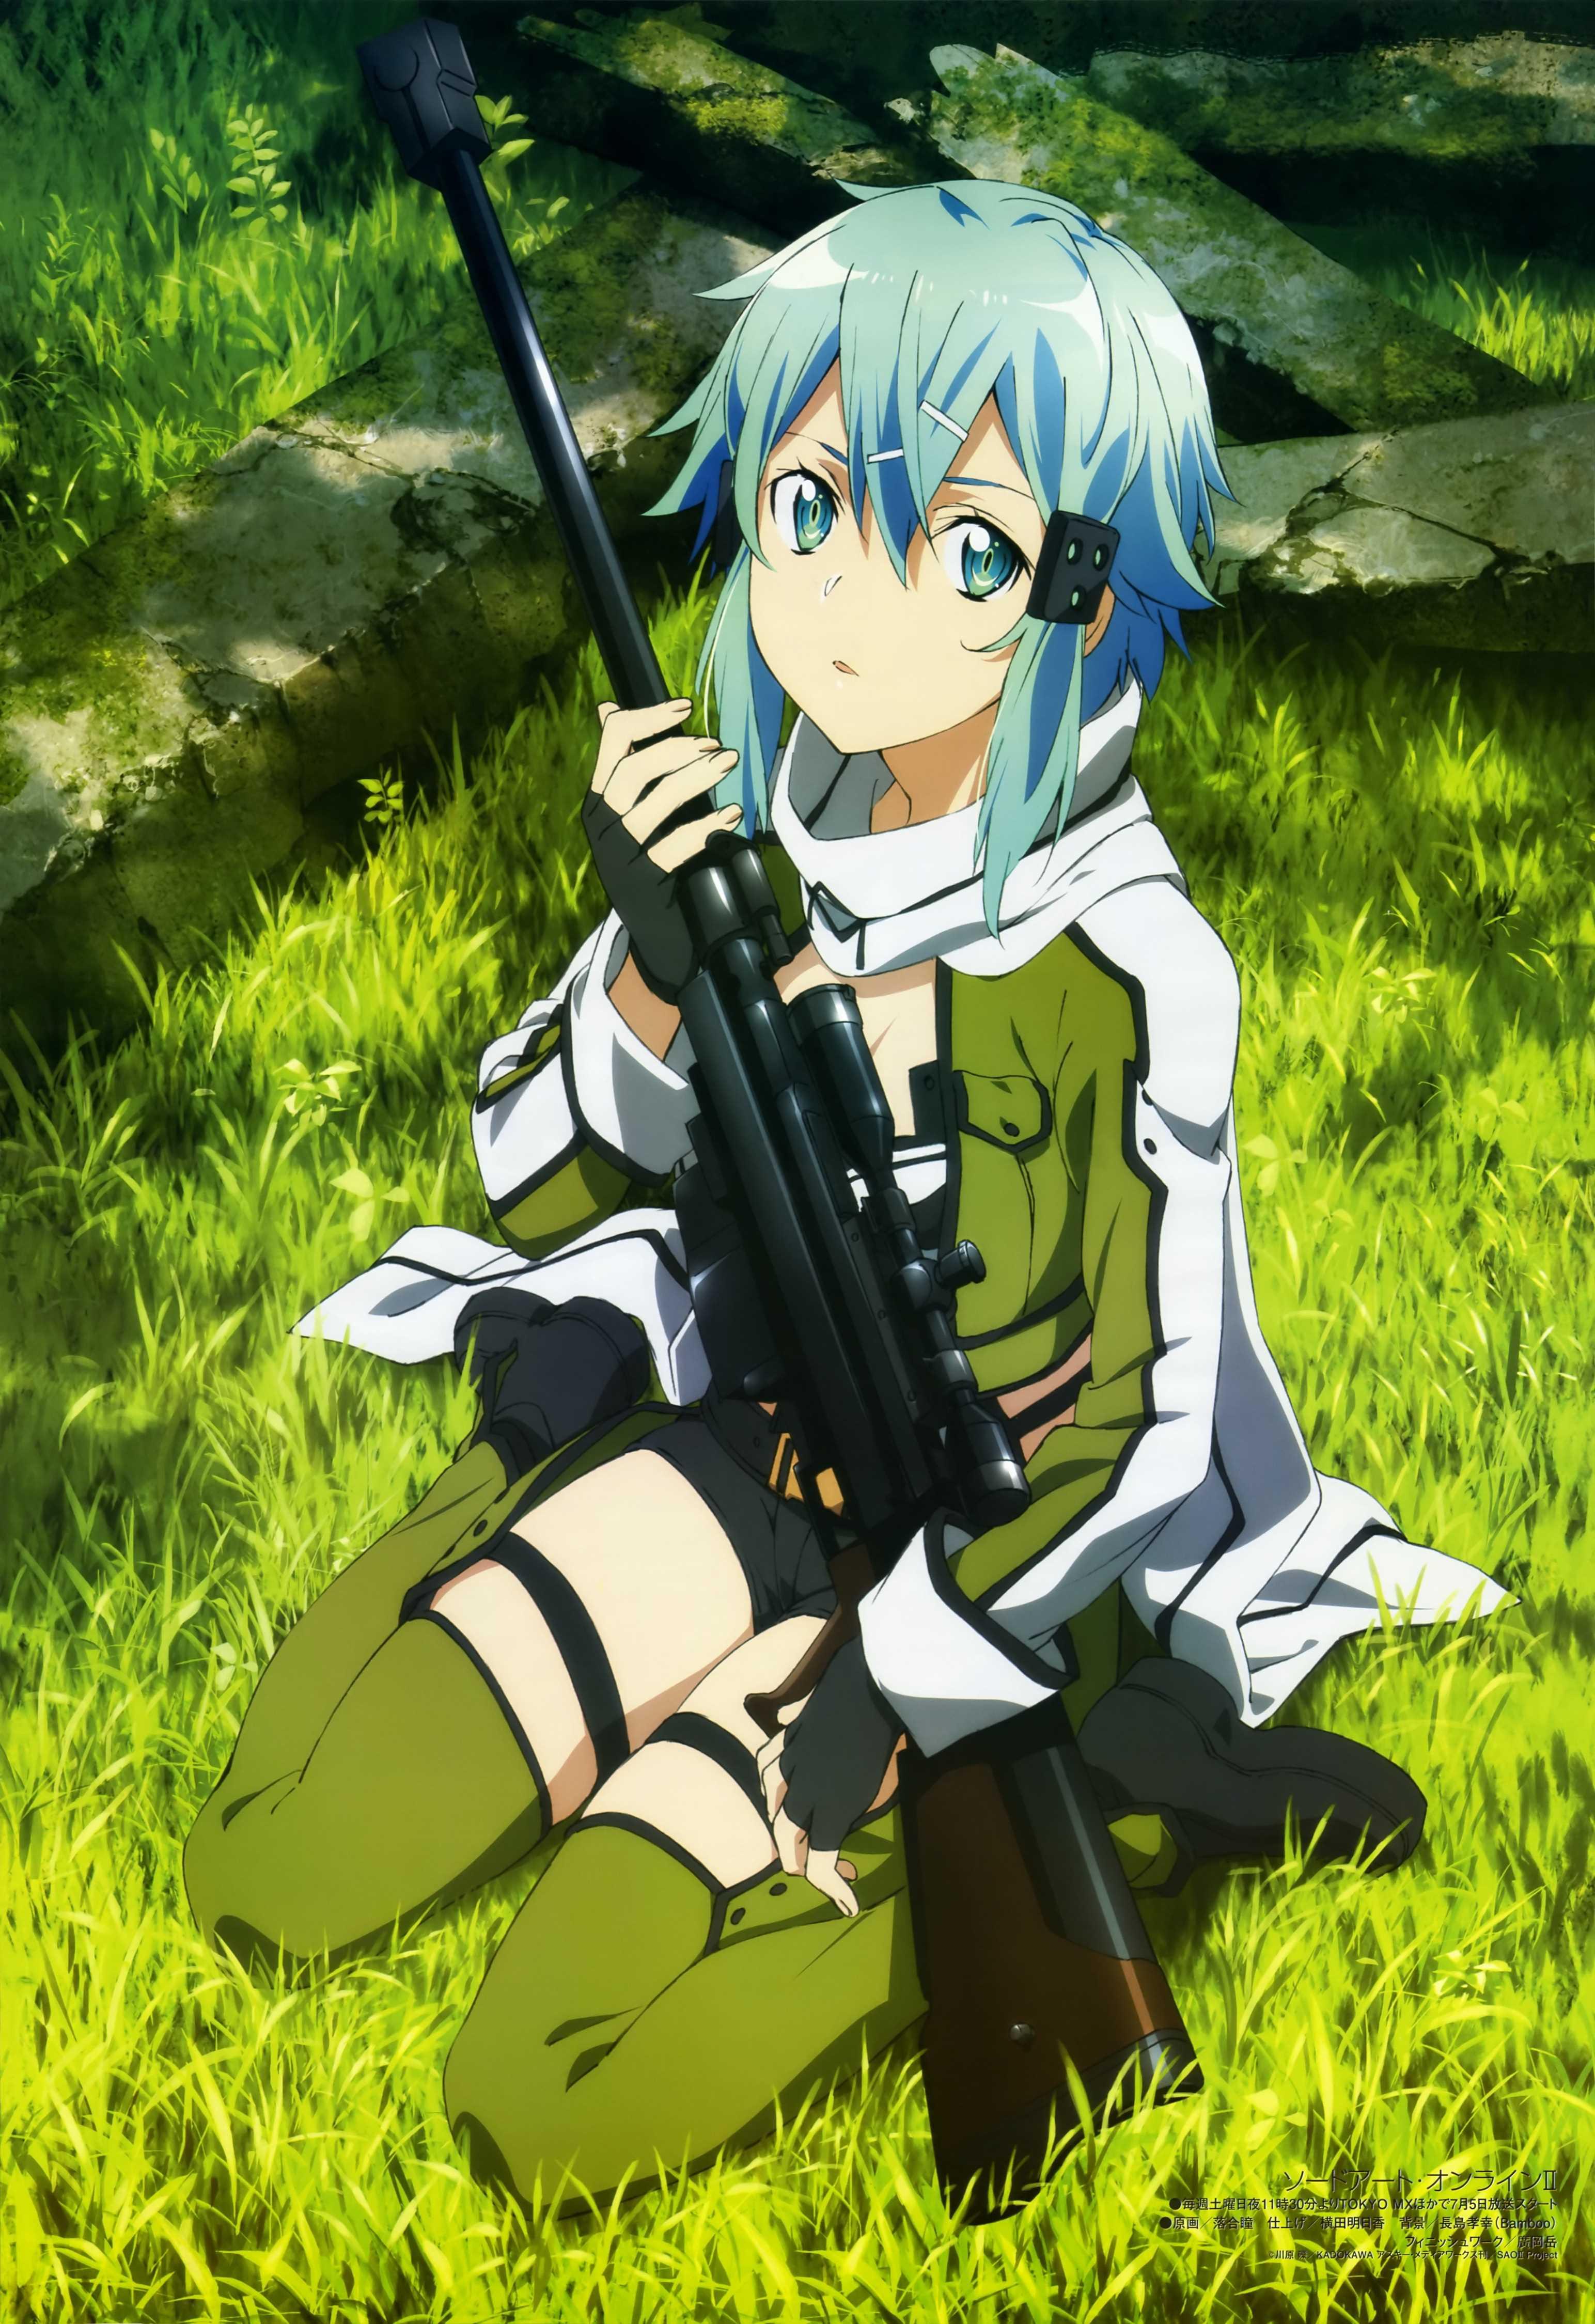 Anime 3088x4500 Sword Art Online Asada Shino anime girls